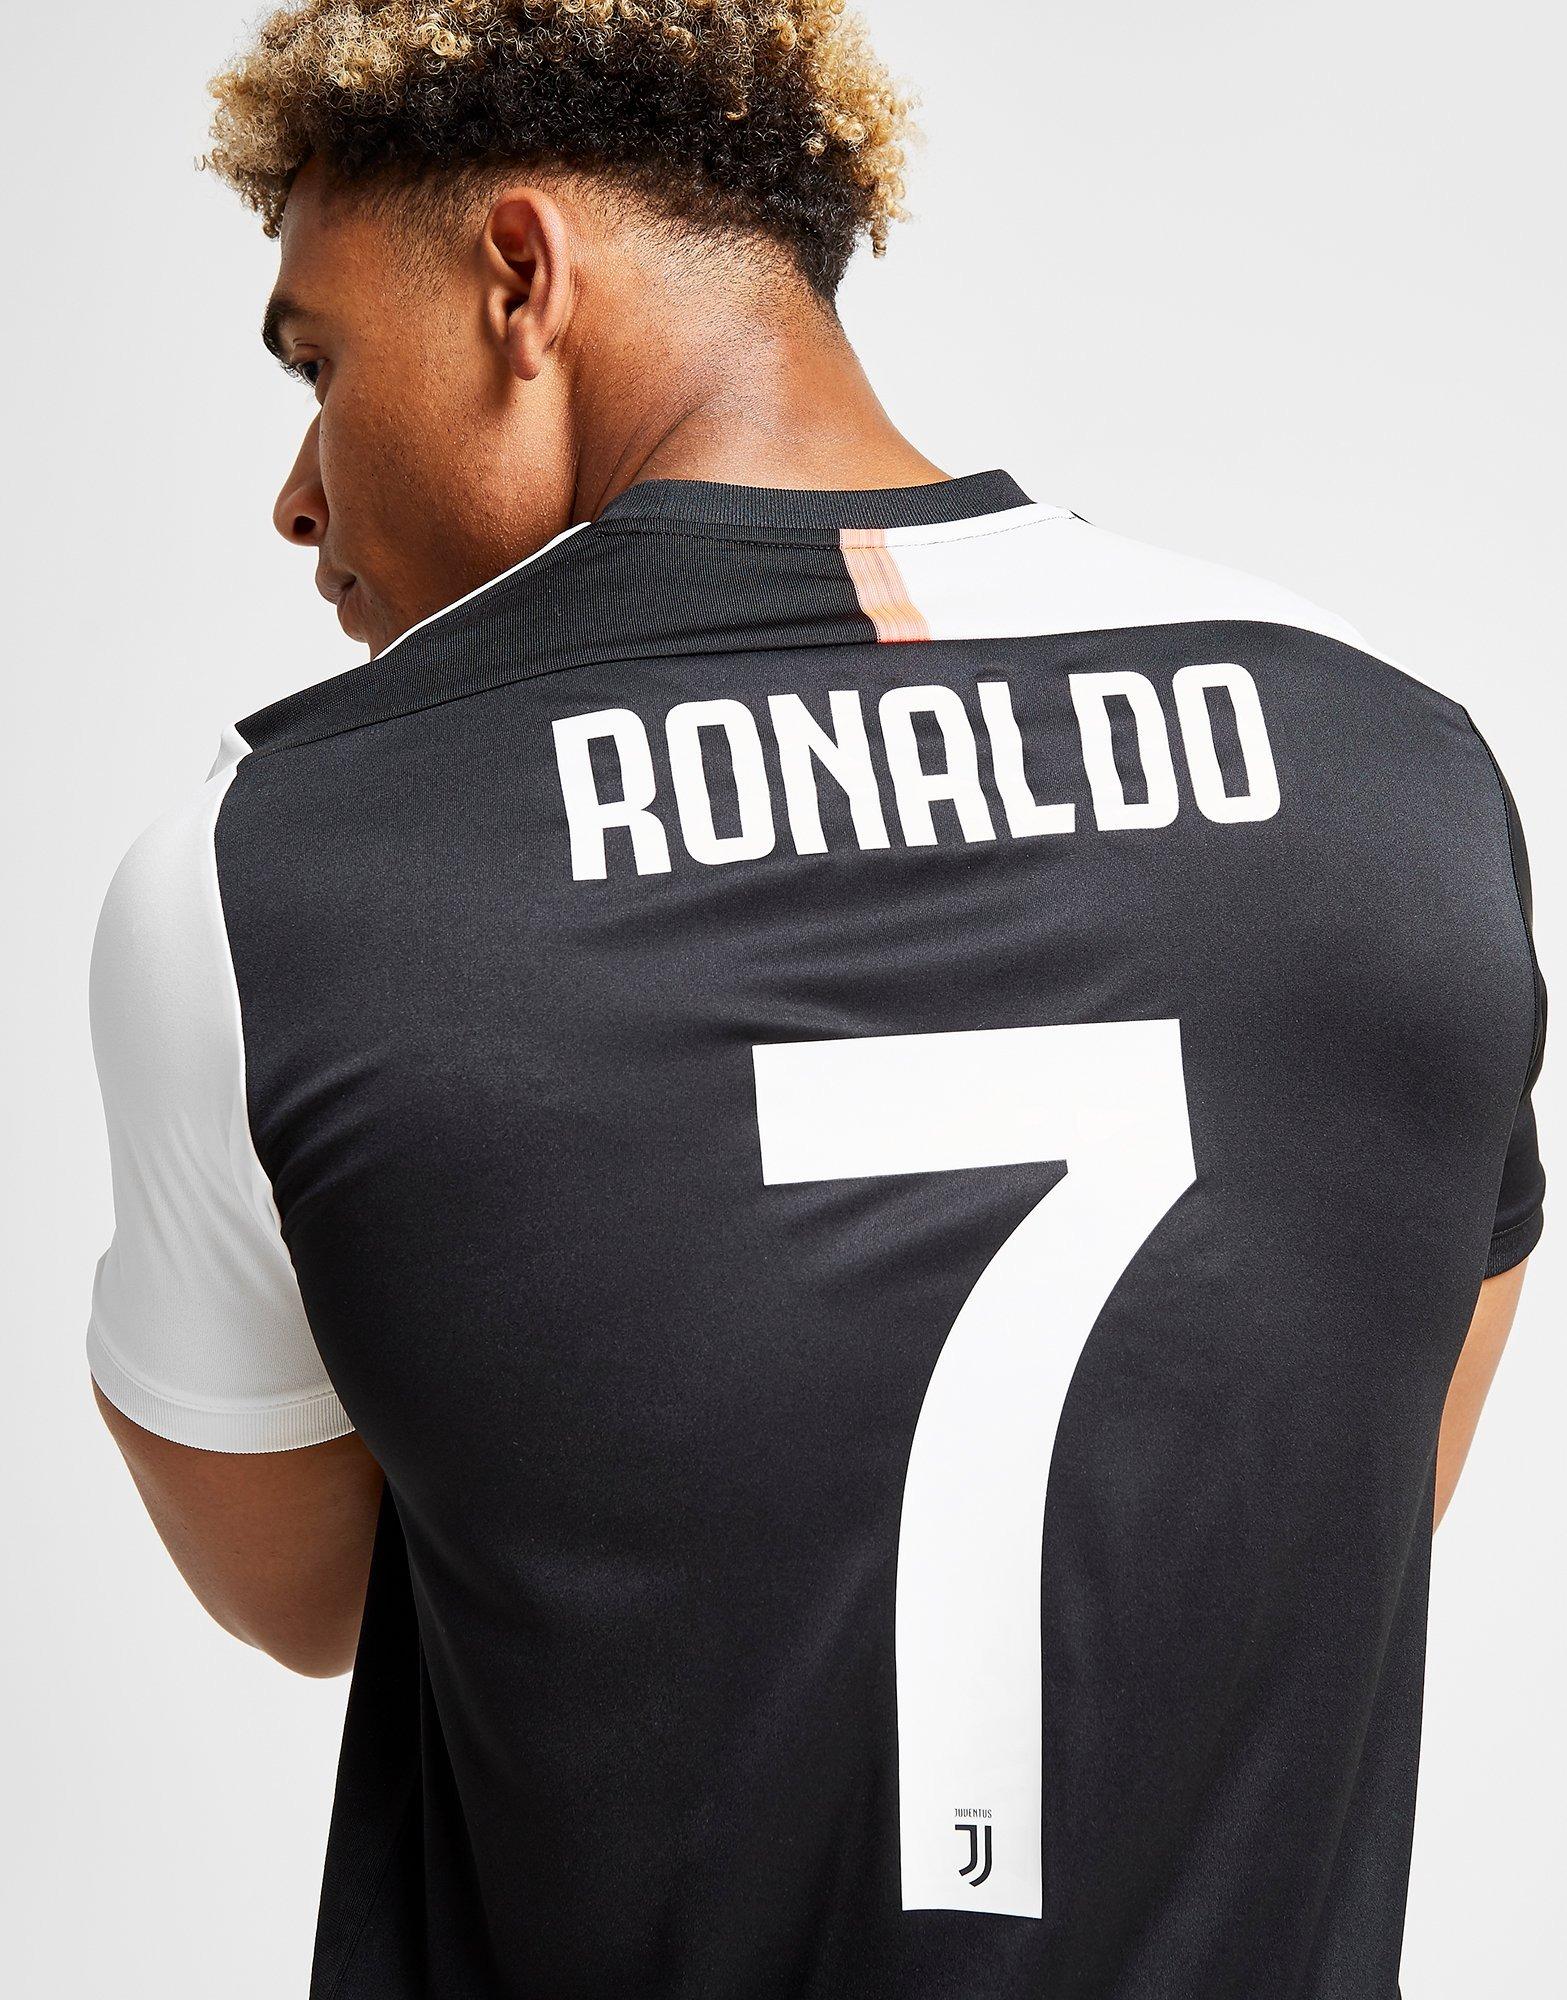 Denim Jacket Football Jerseys Ronaldo Manchester